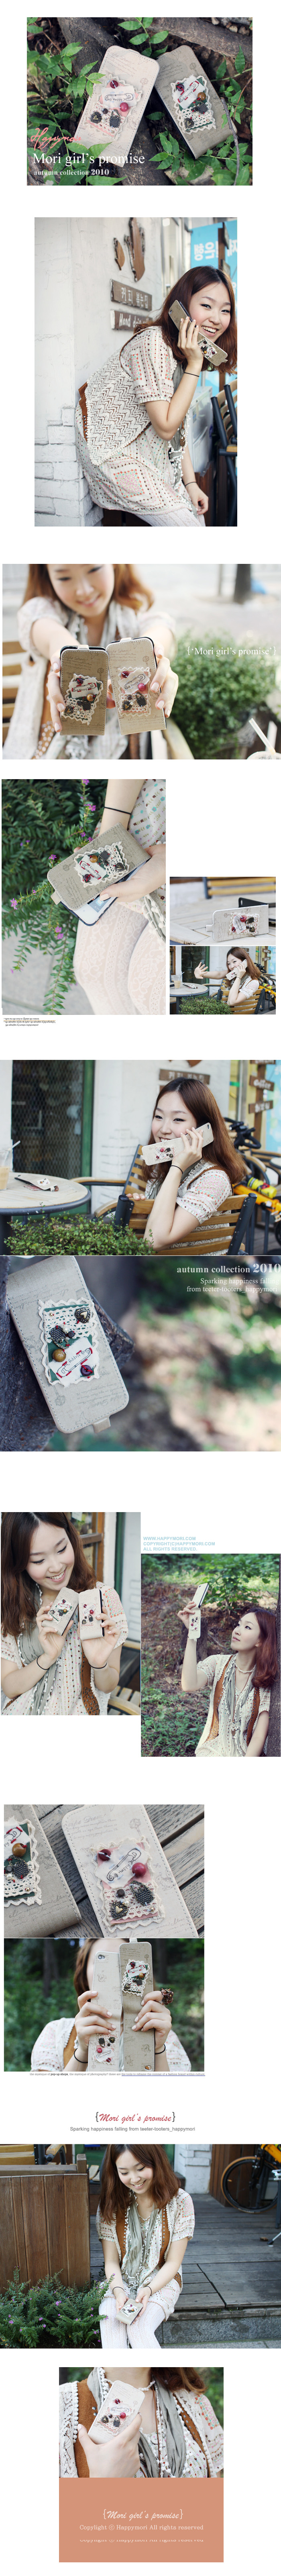 Happymori iPhone4S/4  話題の可愛いケースハッピーモリ-Mori girls promise